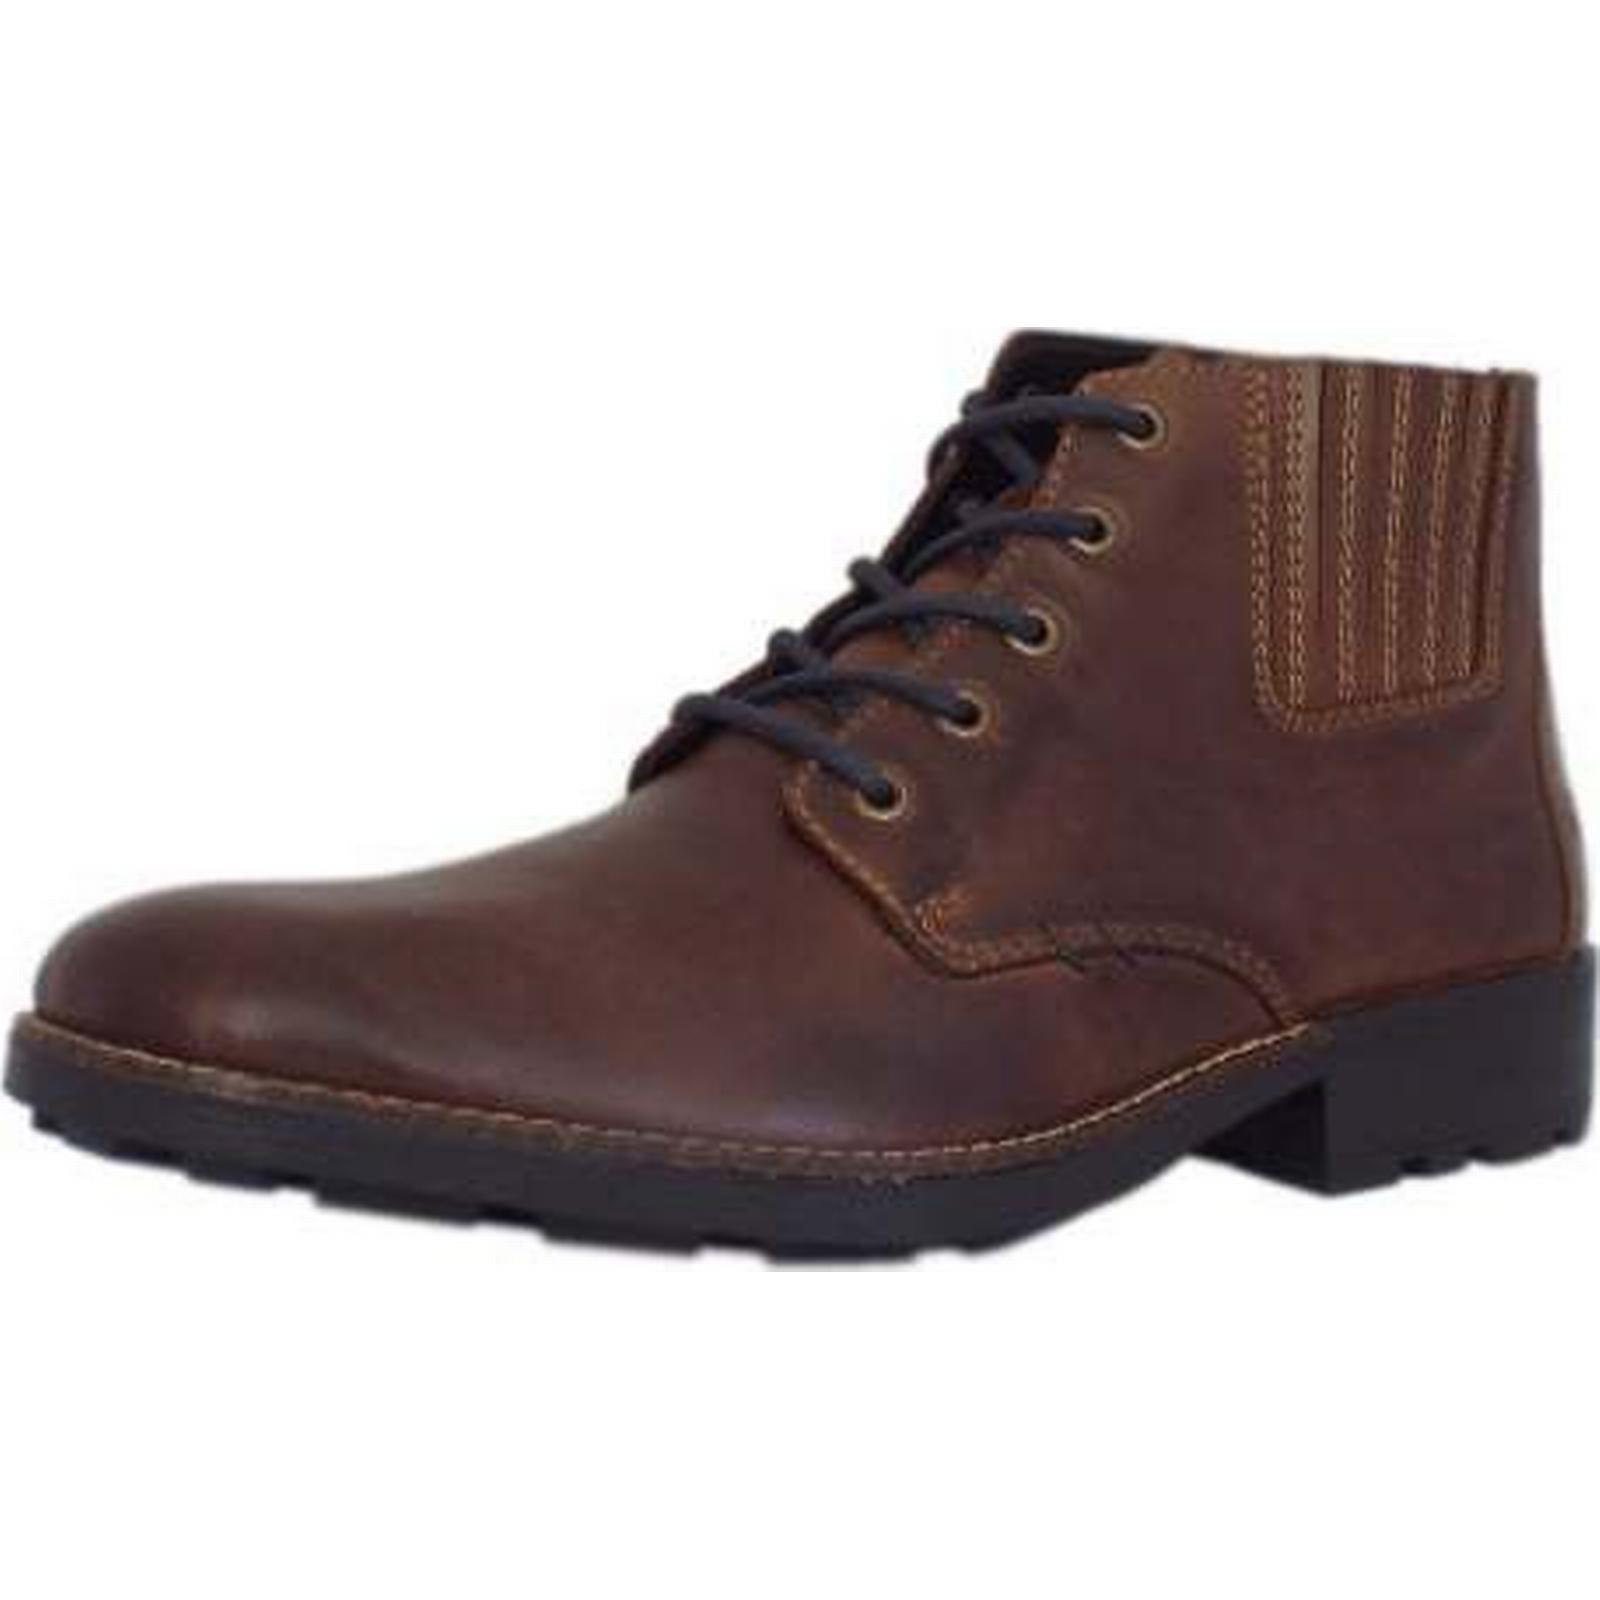 Rieker SEXTON RIEKER MENS BOOTS 47, Size: 47, BOOTS Colour: BROWN 399cff